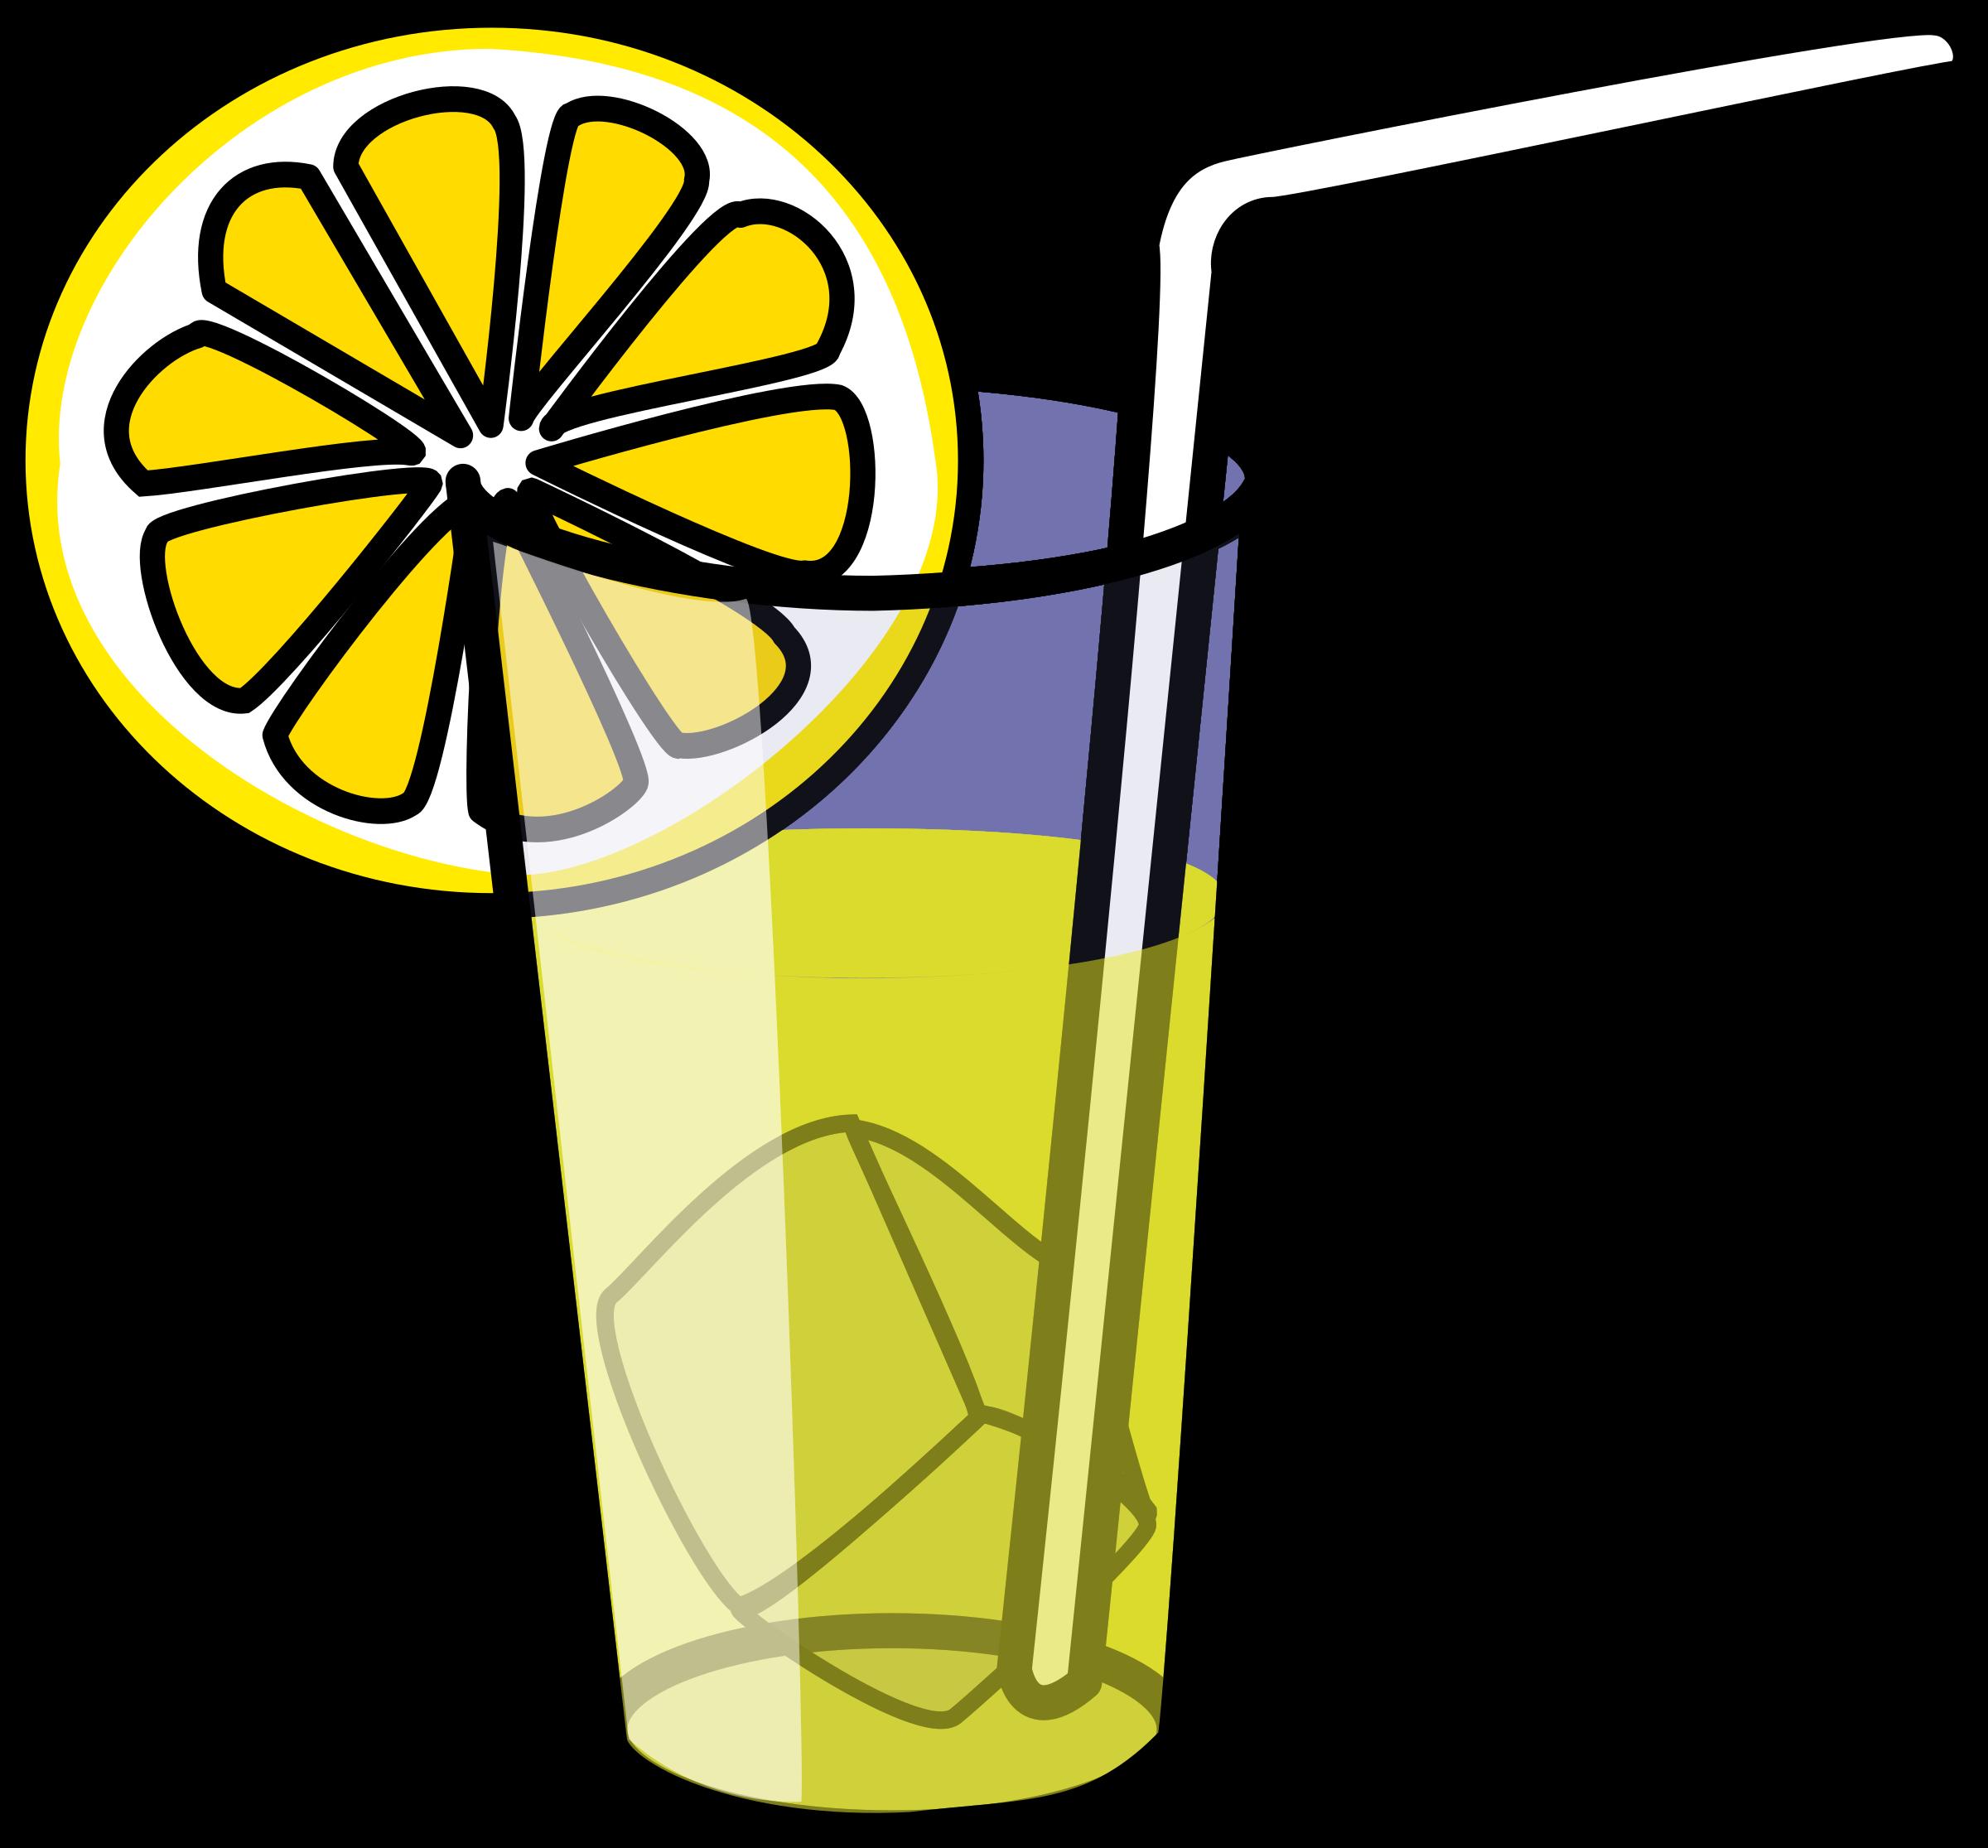 Glass clipart lemon. Lemonade big image png